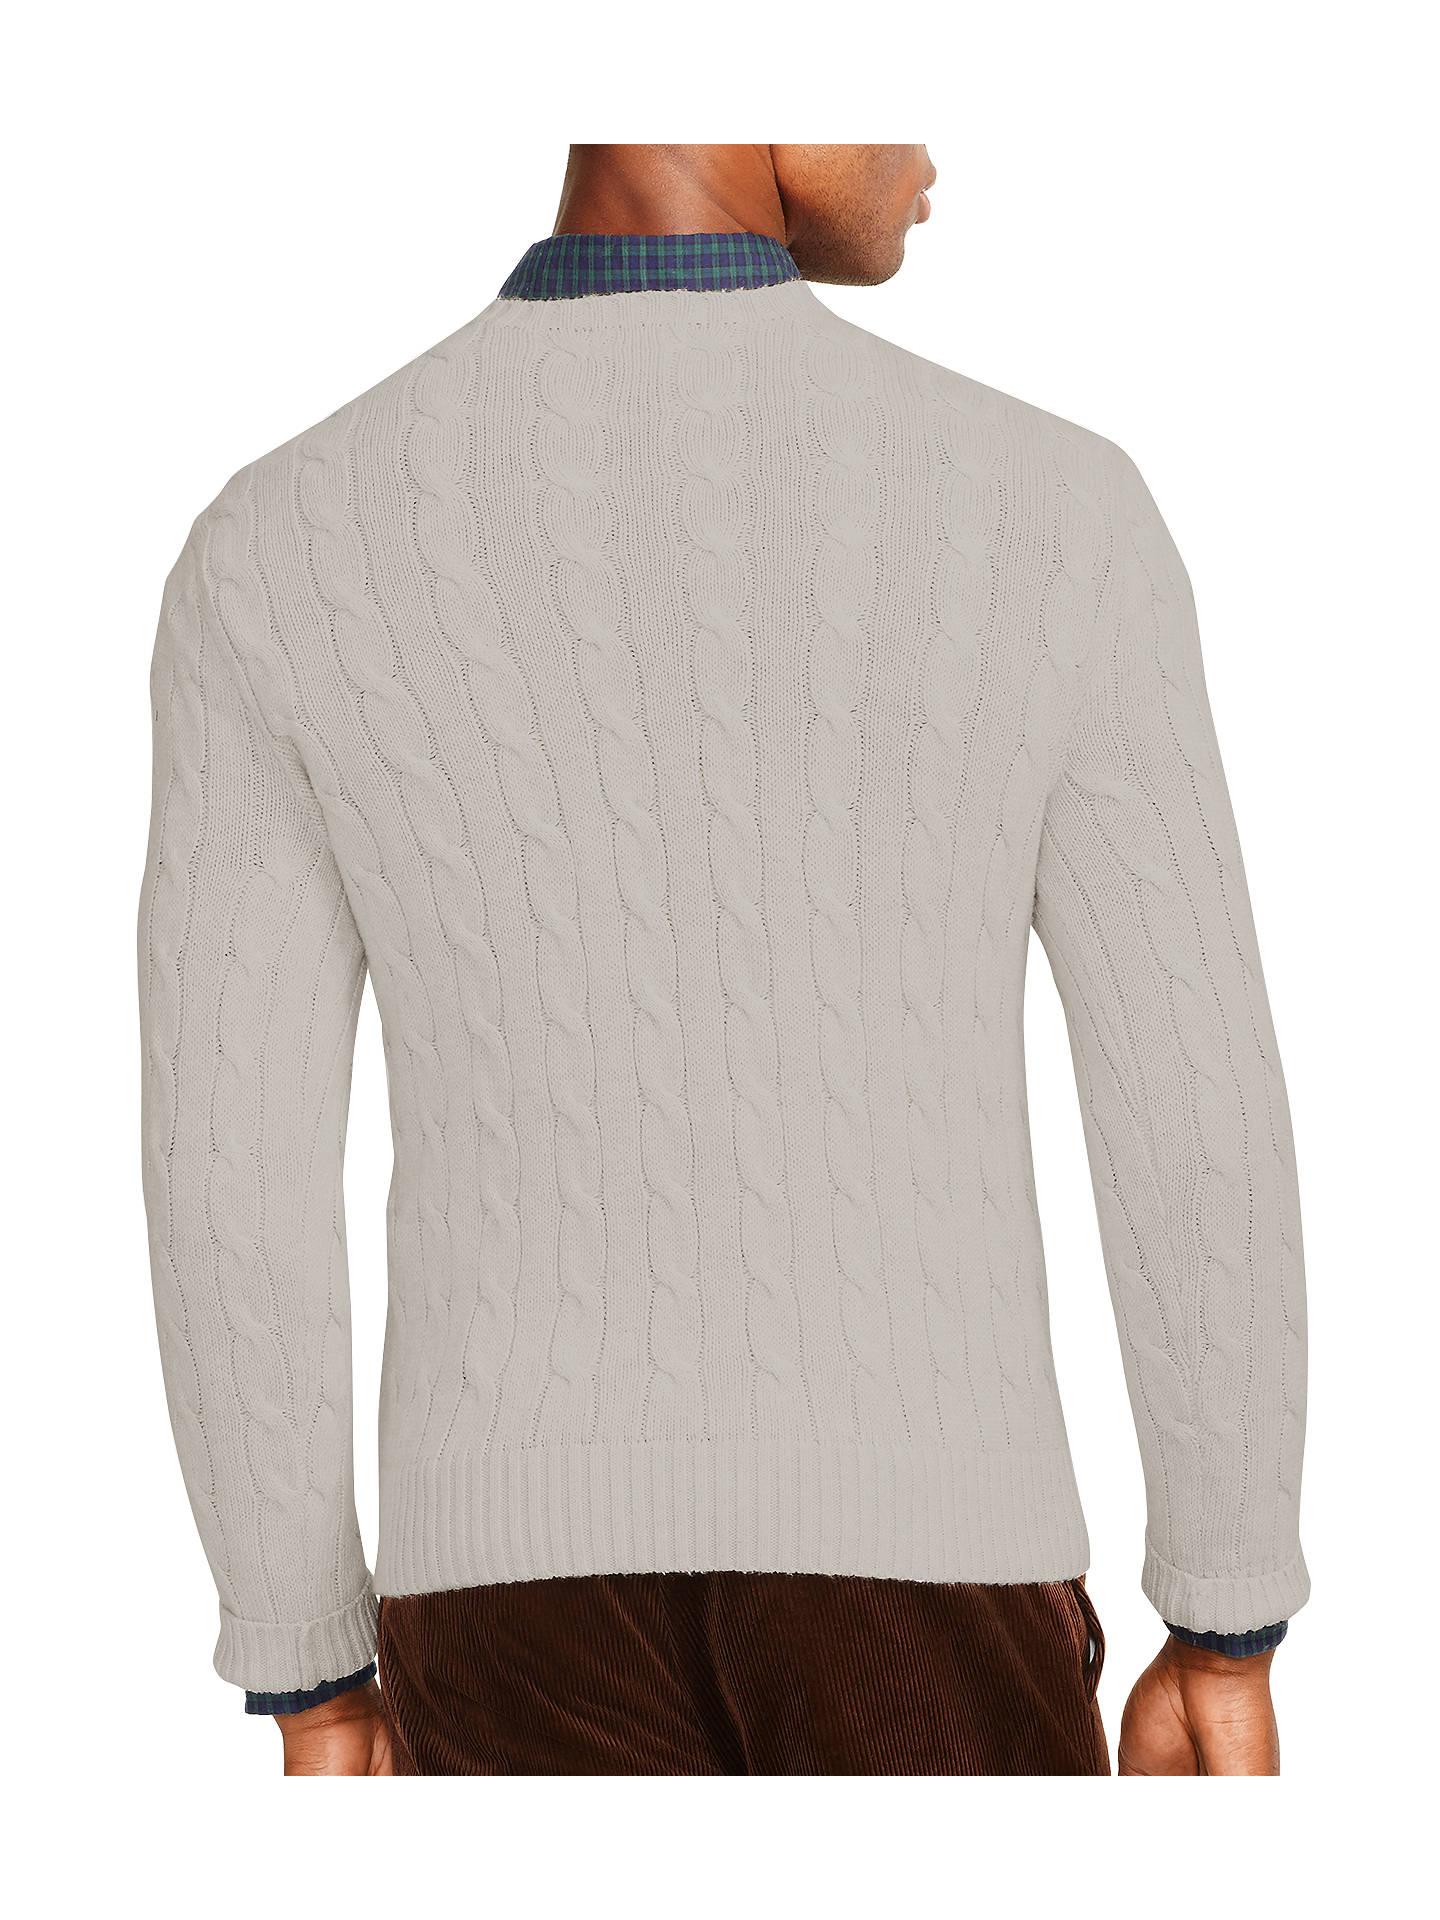 720b6c7993da4 ... Buy Polo Ralph Lauren Cable Knit Crew Neck Jumper